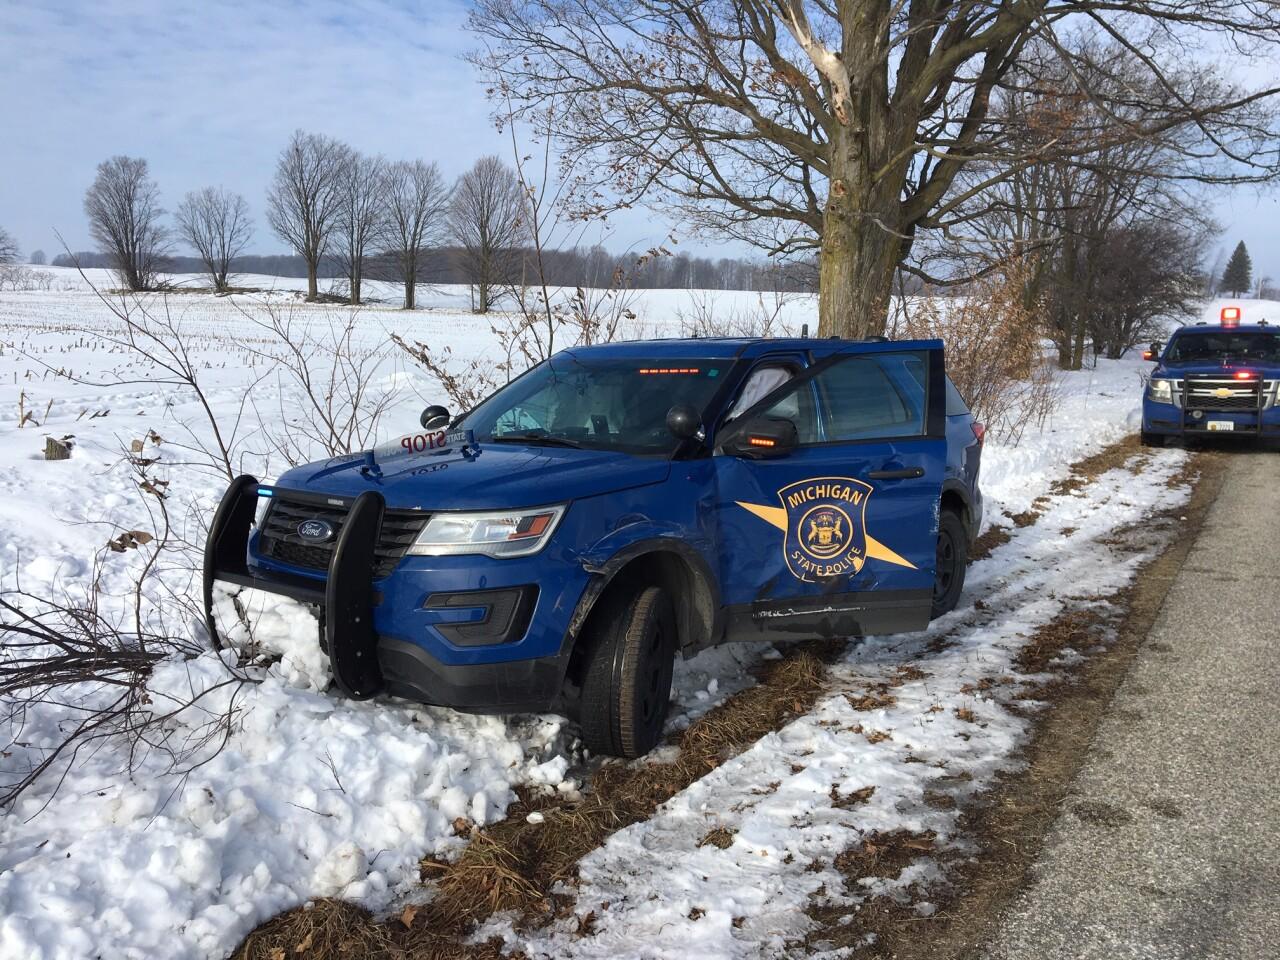 Michigan State Police Vehicle in a ditch